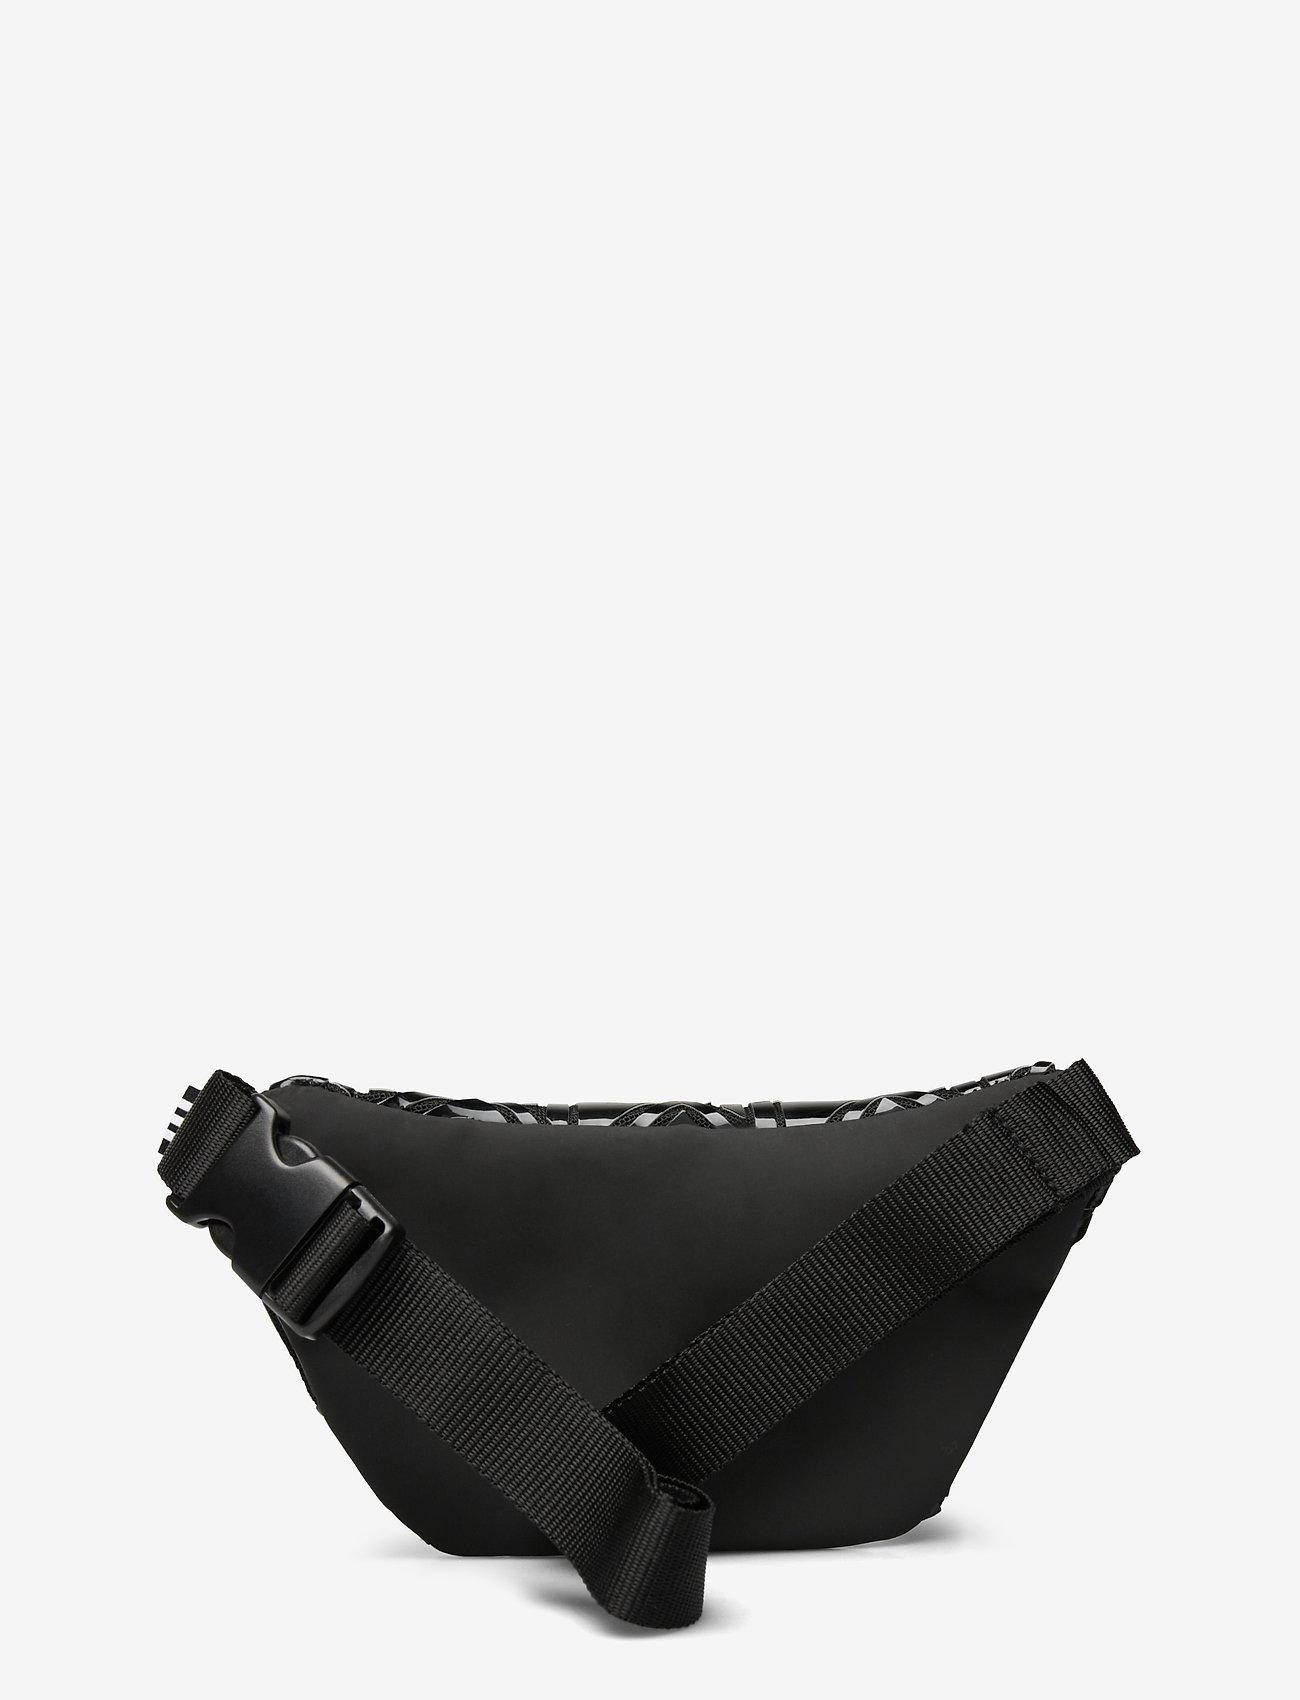 adidas Originals - WAISTBAG 3D - tassen - black - 1